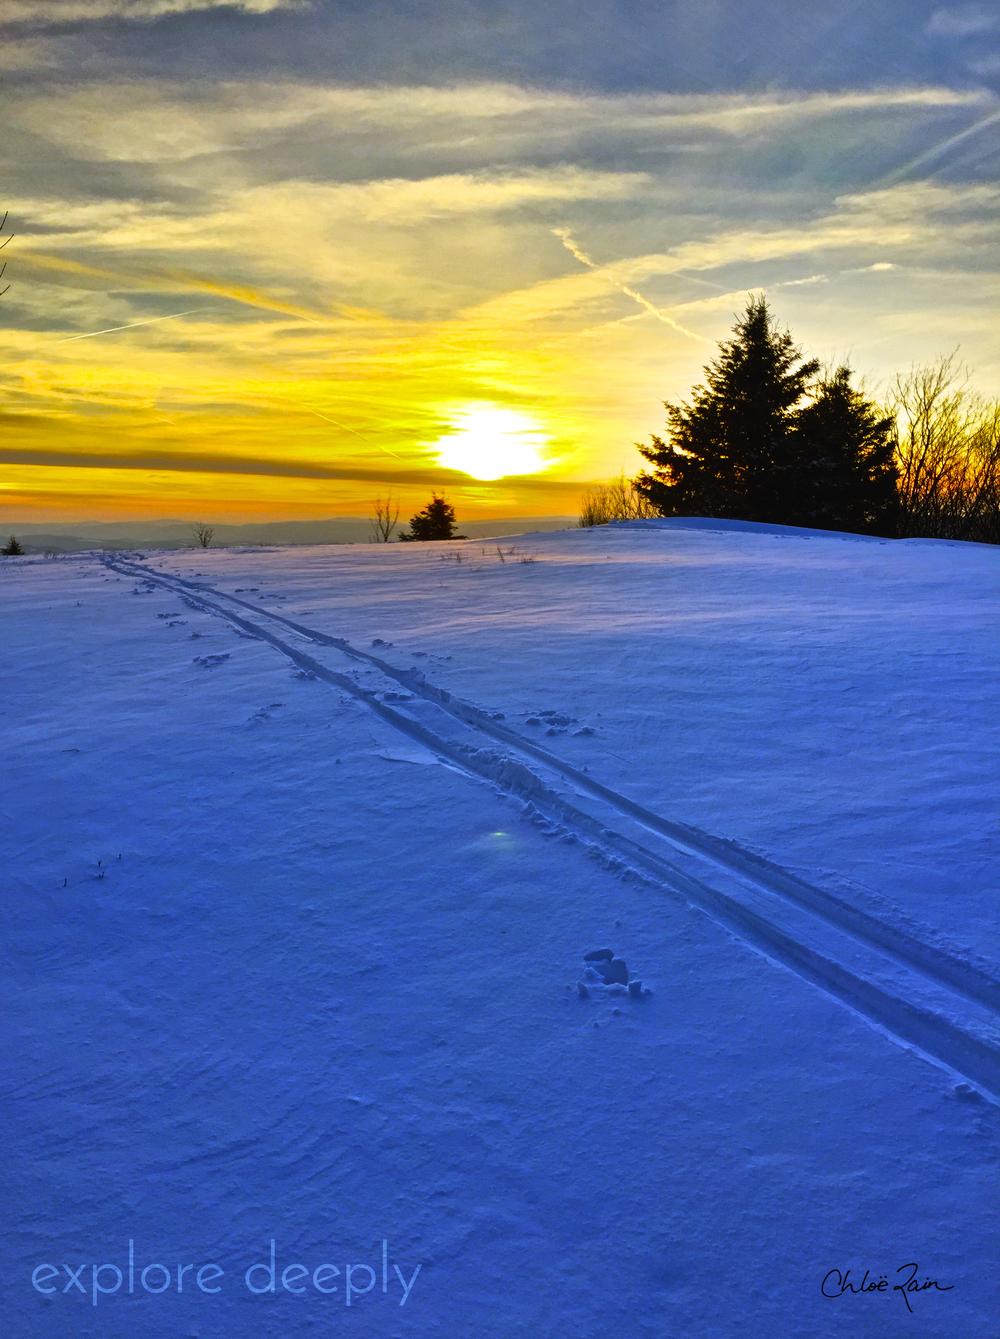 White Grass Ski Touring Center Explore Deeply